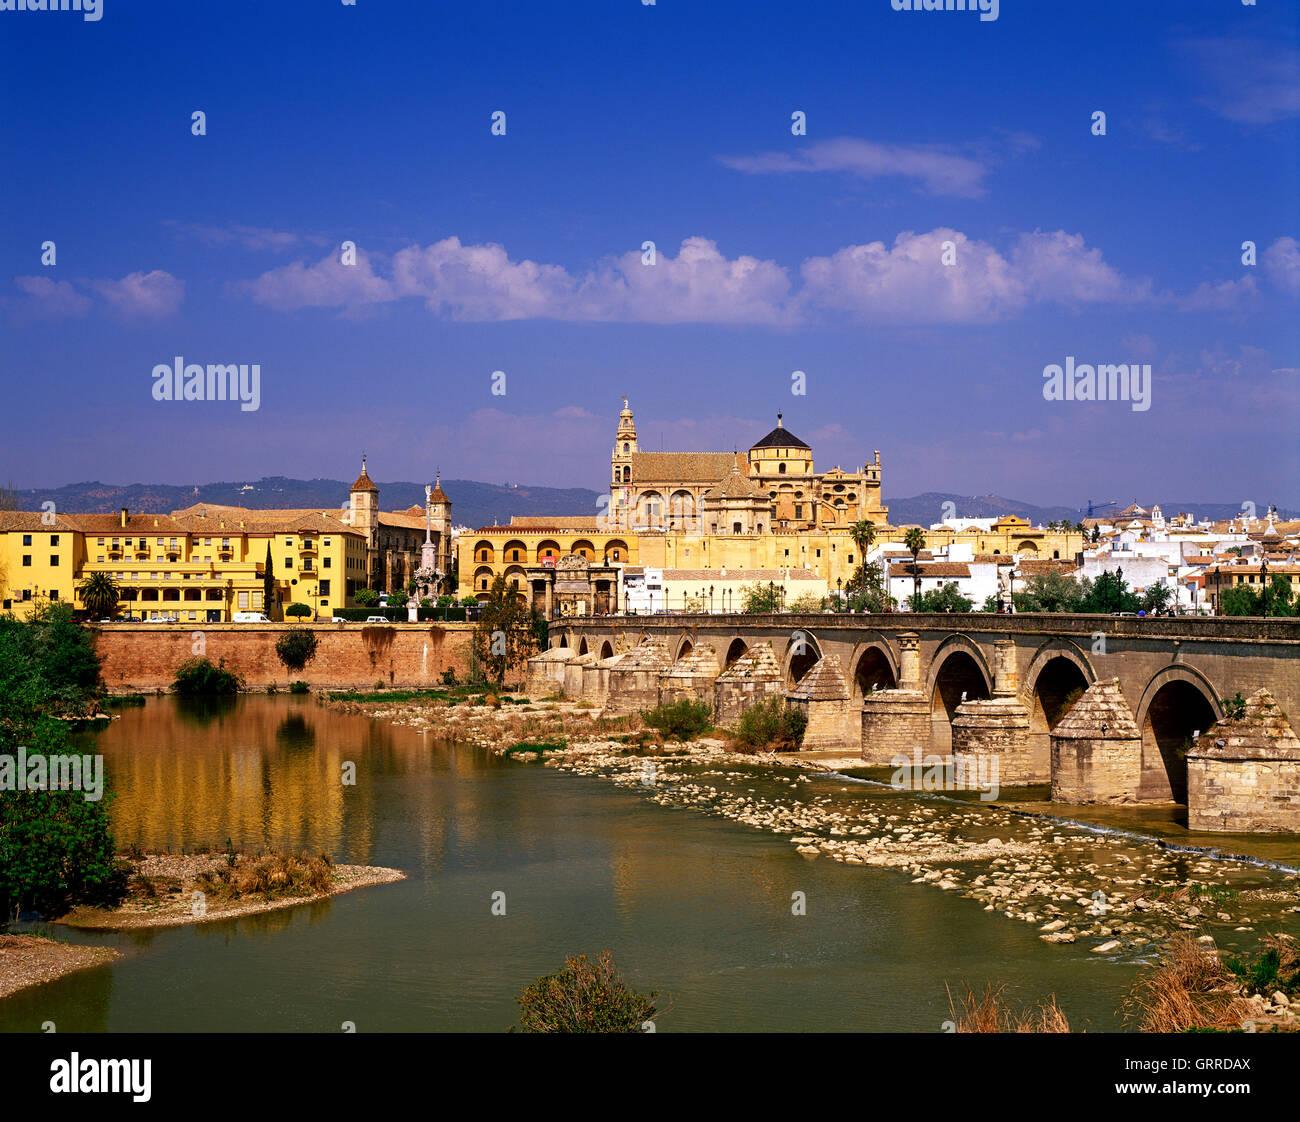 Roman Bridge and Cathedral, Cordoba, Andalucia, Spain Stock Photo